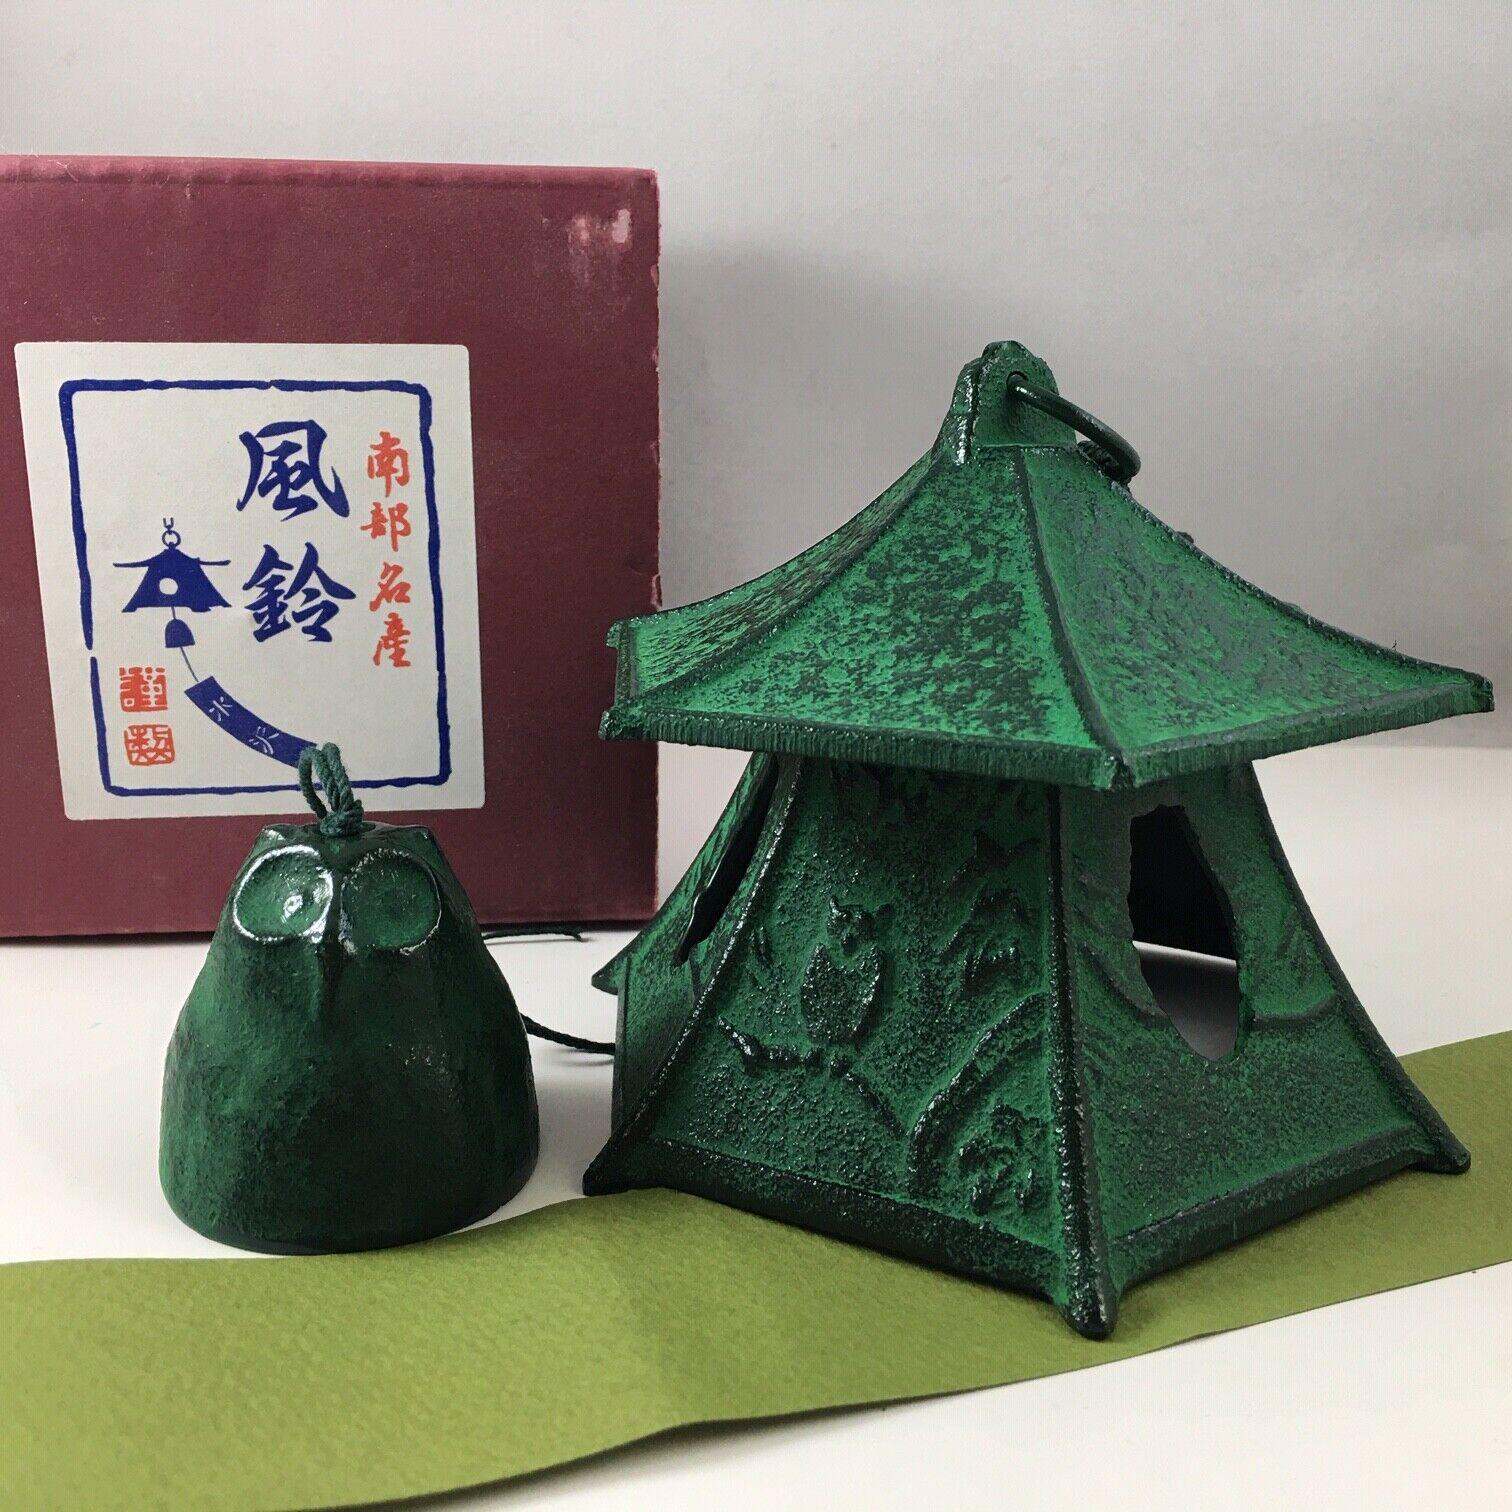 Kotobuki Japanese Wind Chime Cast Iron Green Horned Owl Lantern Made in Japan